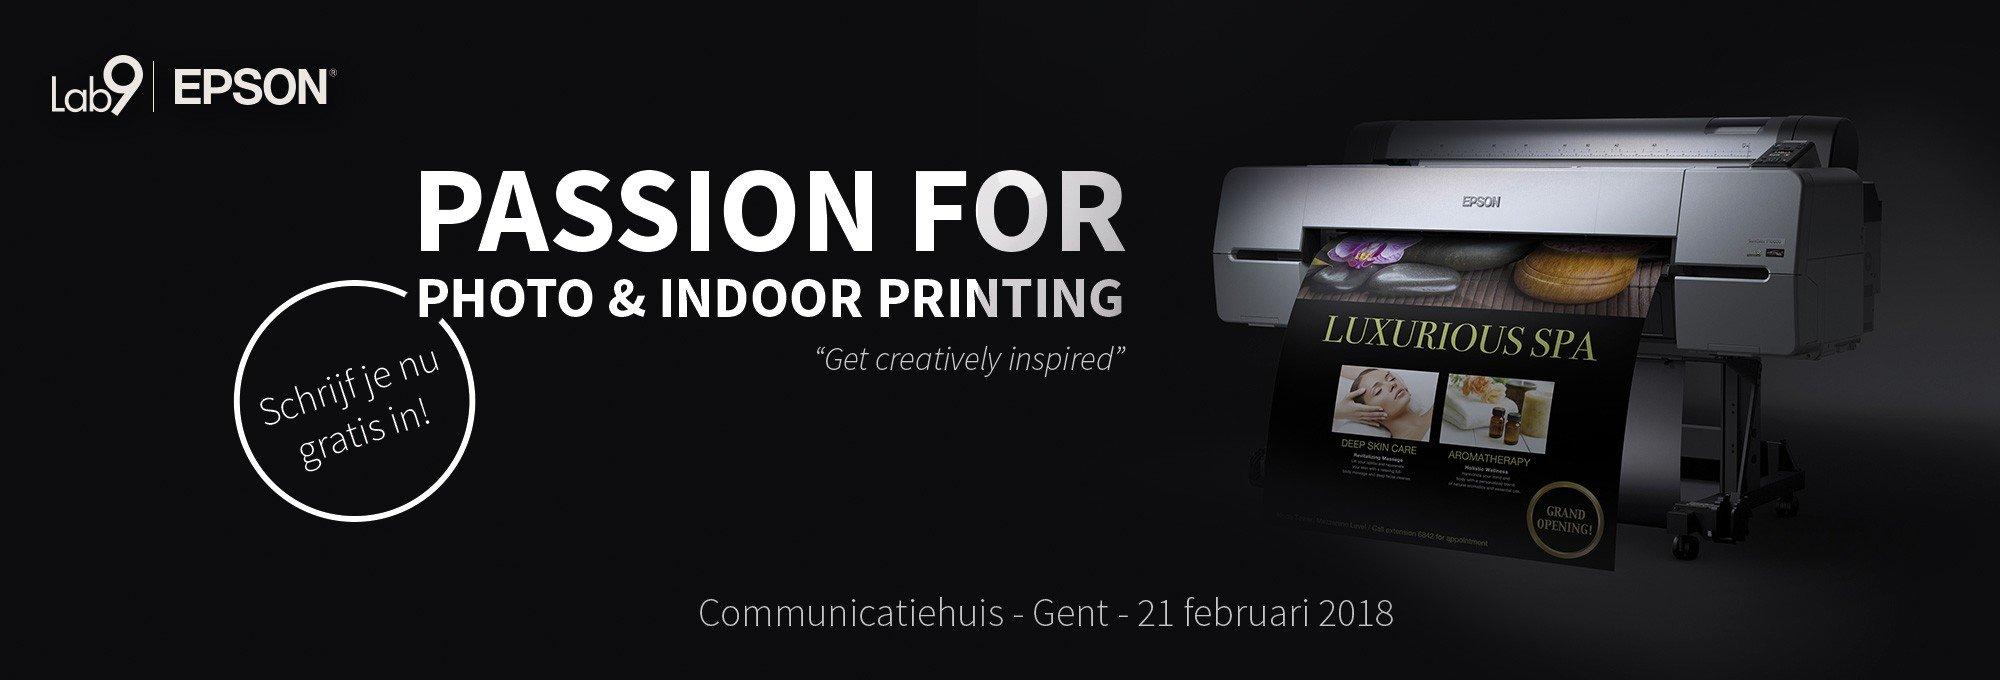 PassionforPrinting2-header.jpg